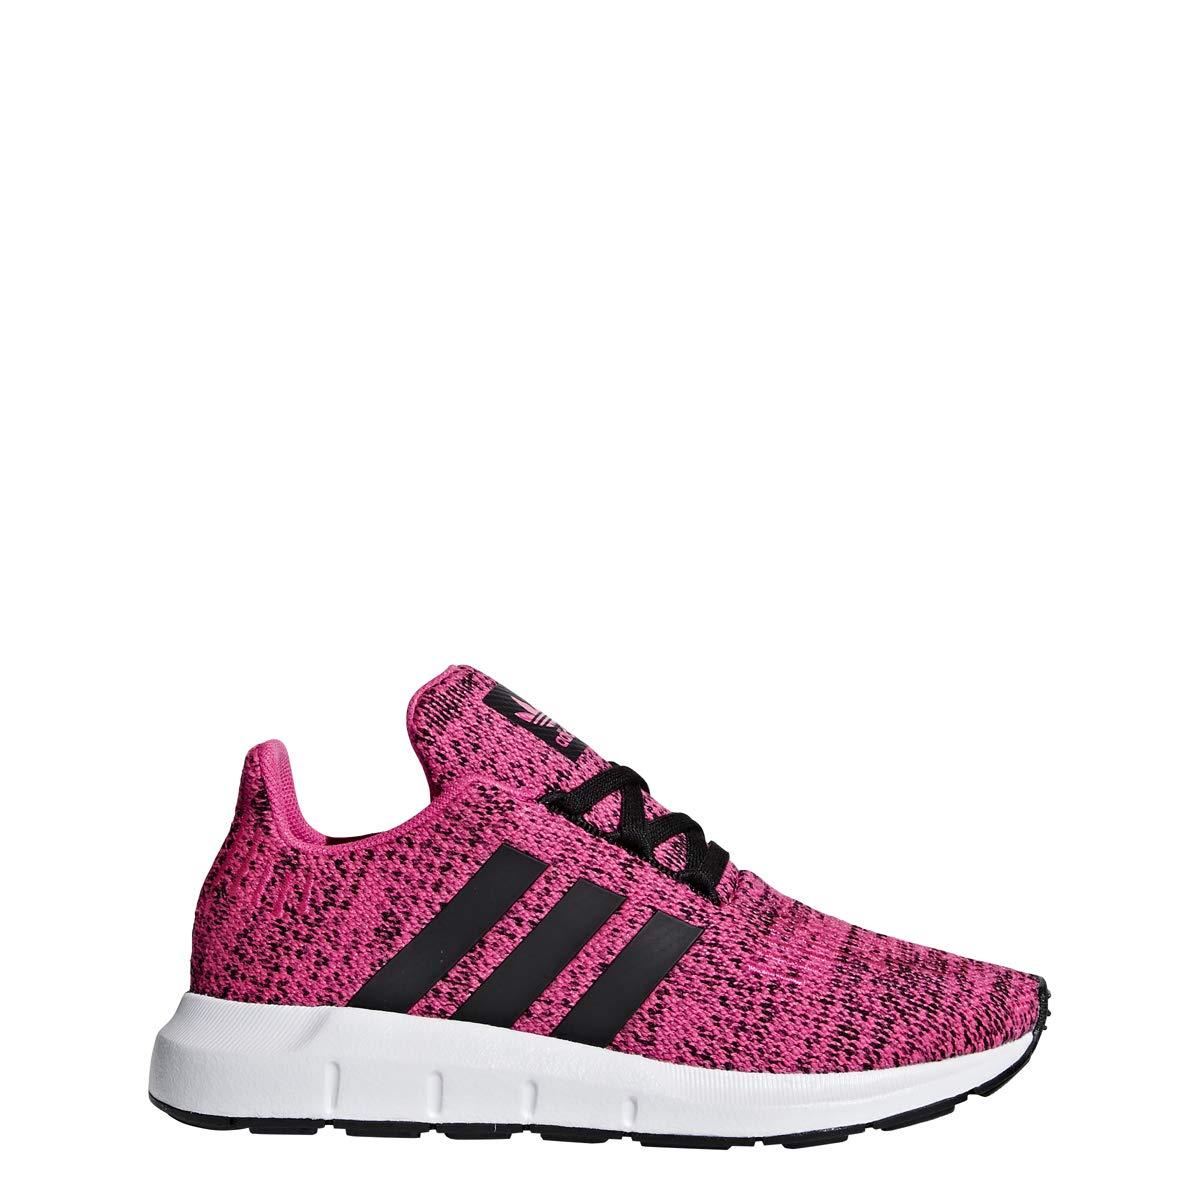 adidas Originals Kids Girl's Swift Run C (Little Kid) Shock Pink/Black 1 M US Little Kid